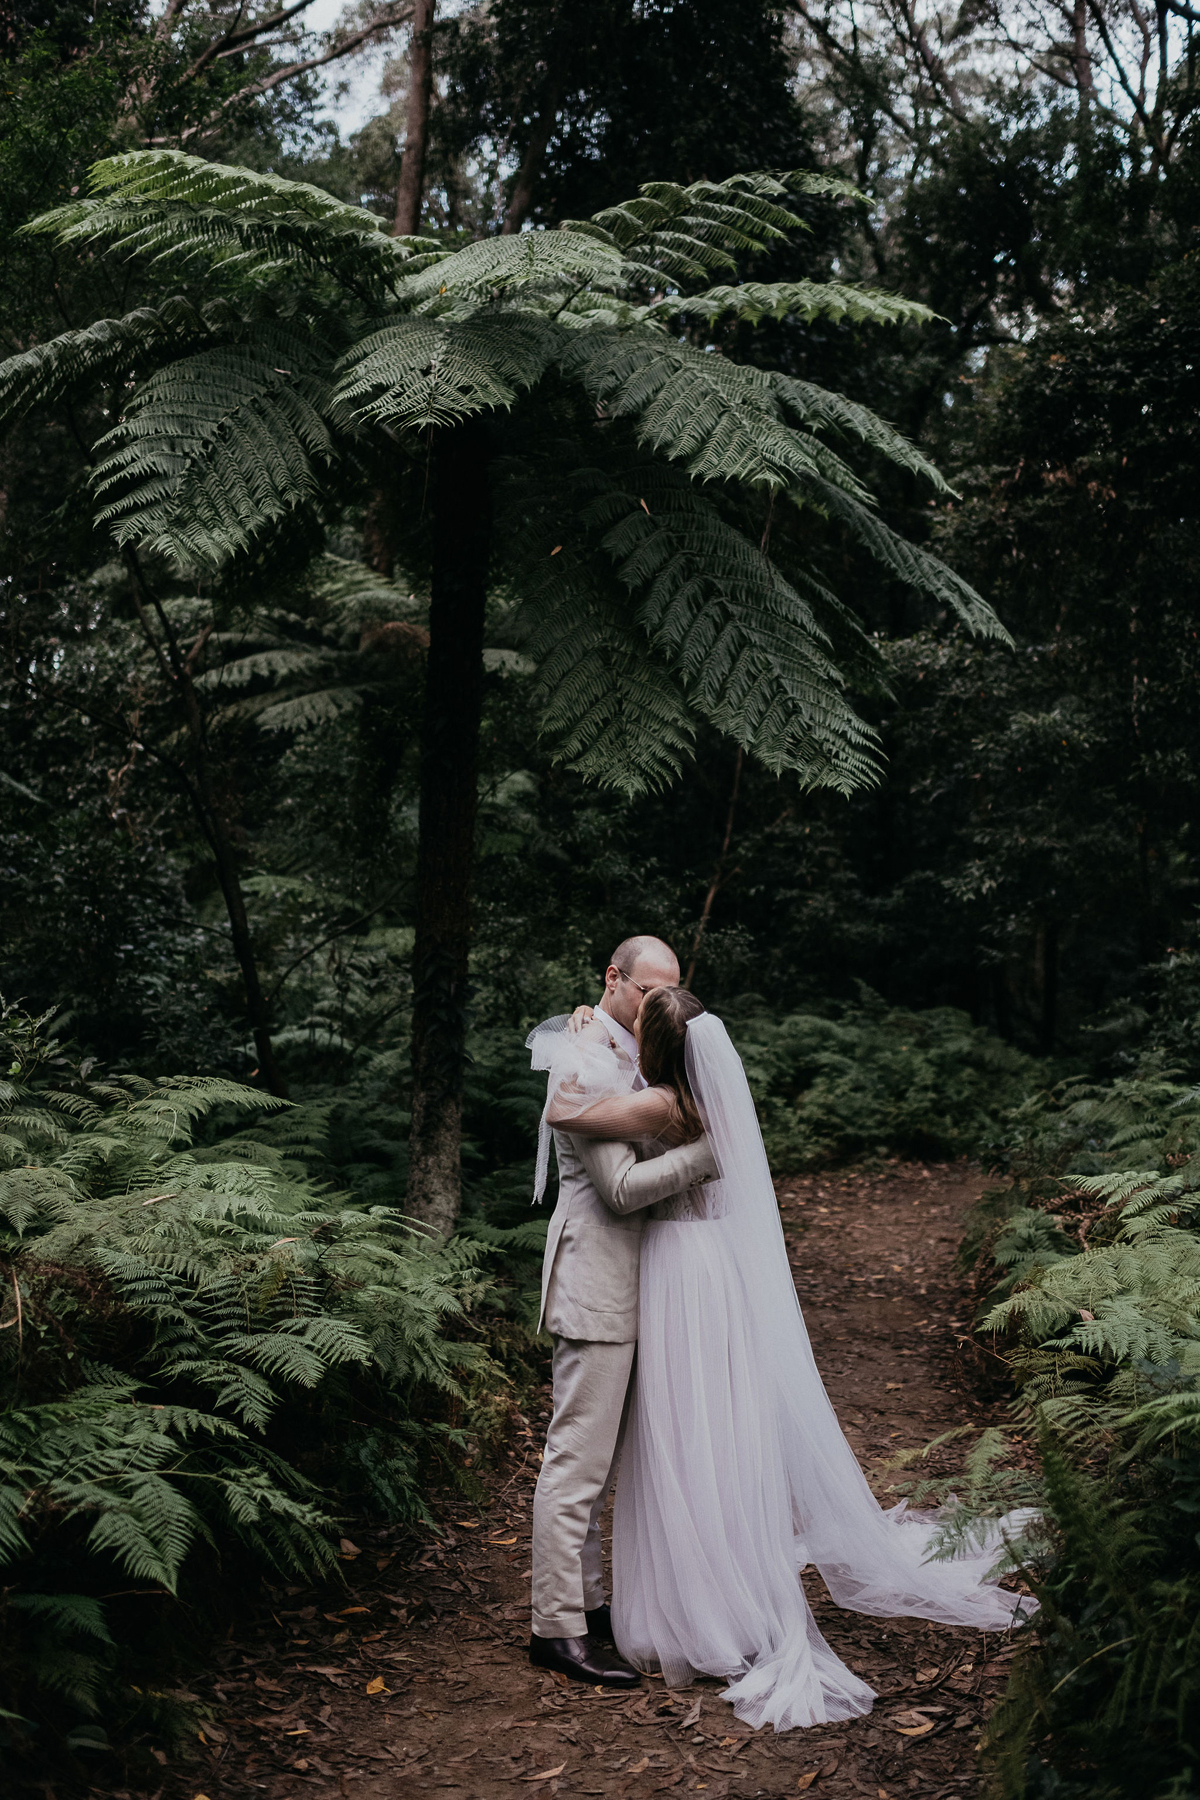 046-jason-corroto-wedding-photography.jpg